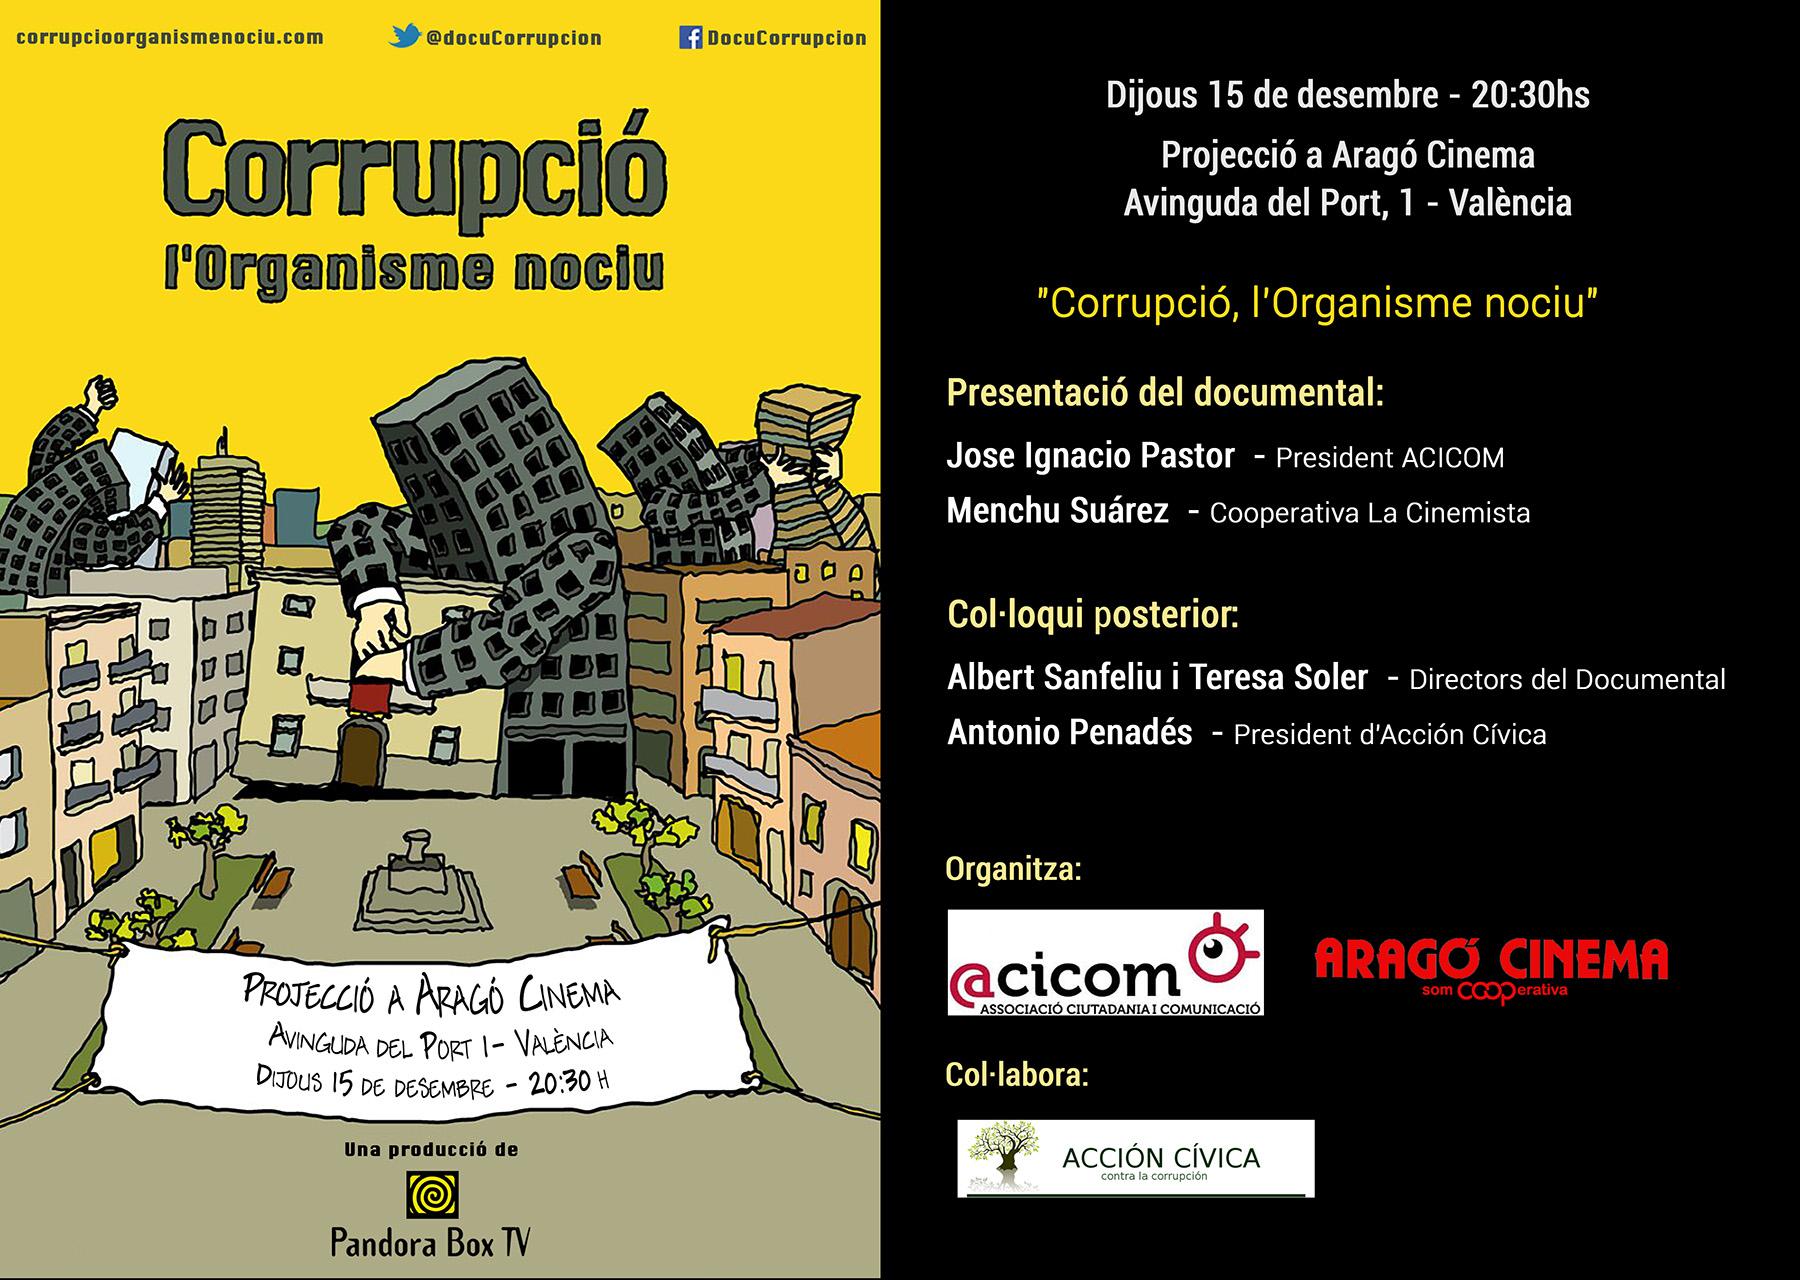 cartell-projeccio-aragocinema_xarxes-1-1